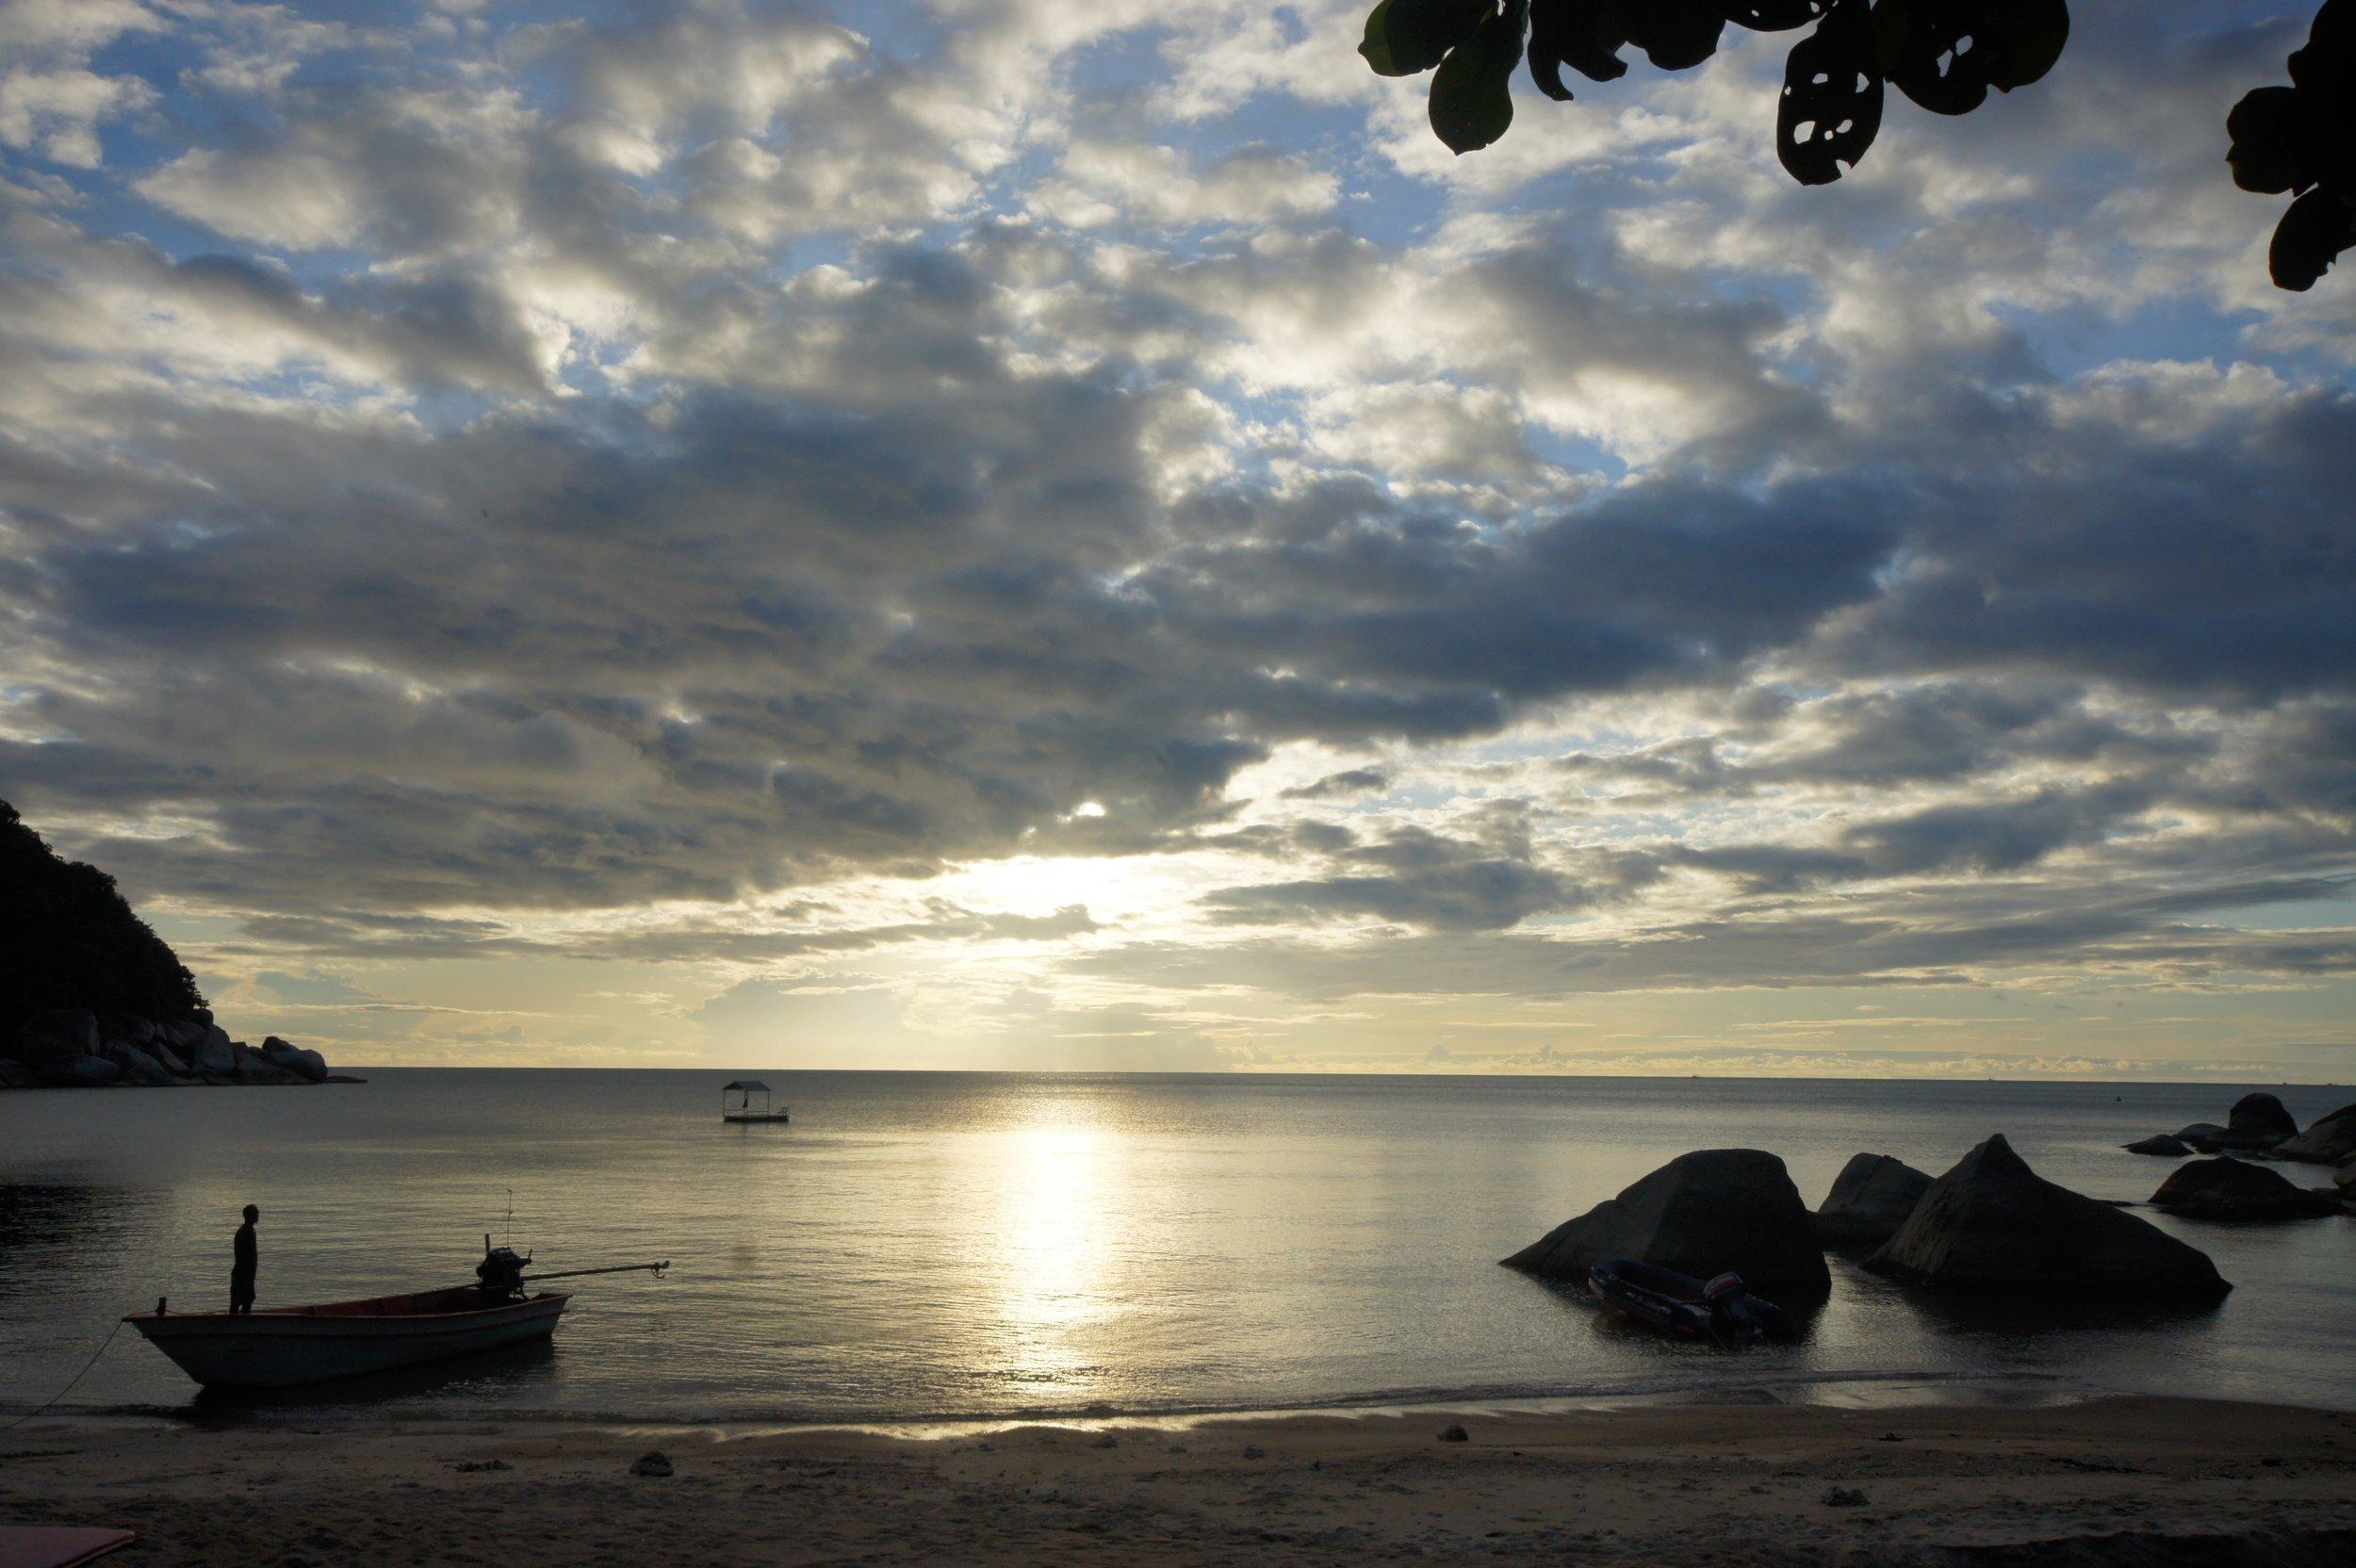 Sunrise on the beach at The Sanctuary Thailand